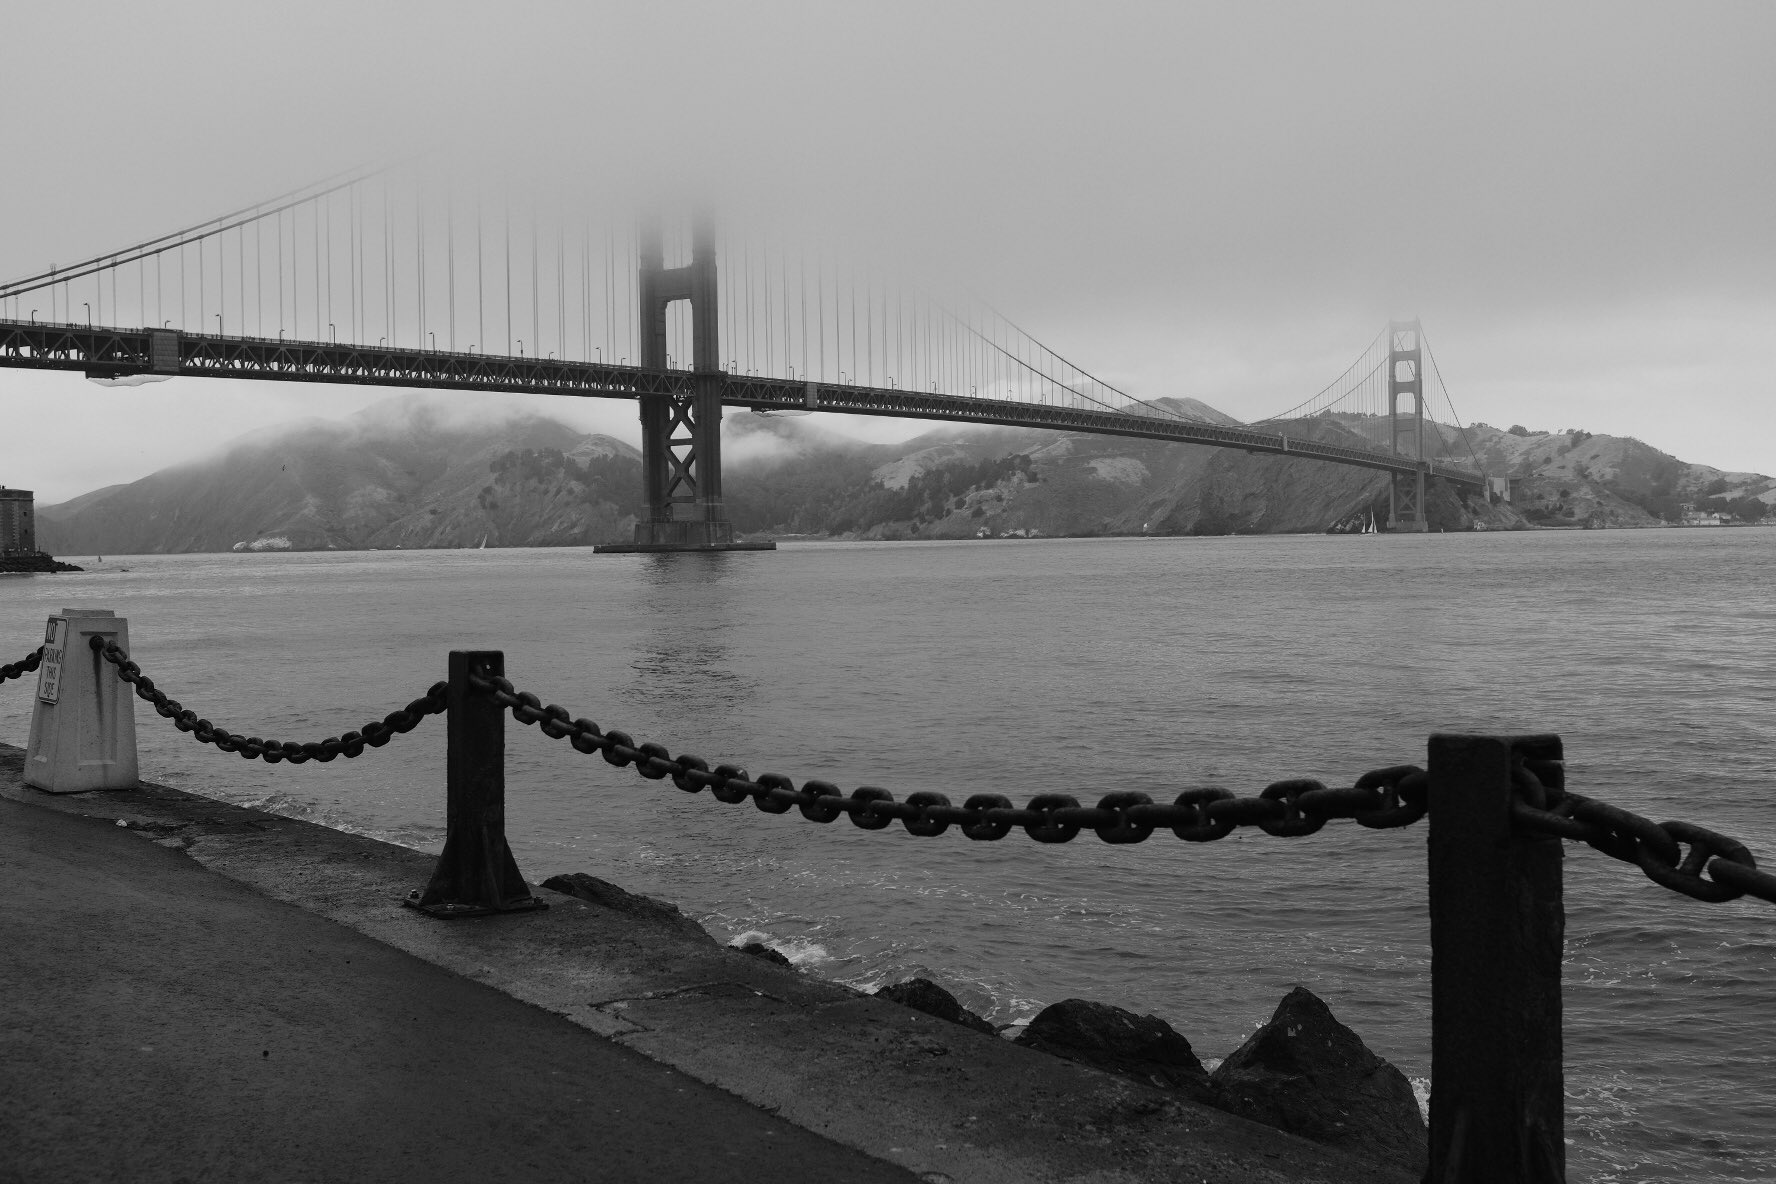 Maybe I should do a walk around camera meet up in SF https://t.co/EDhjYgaG3N